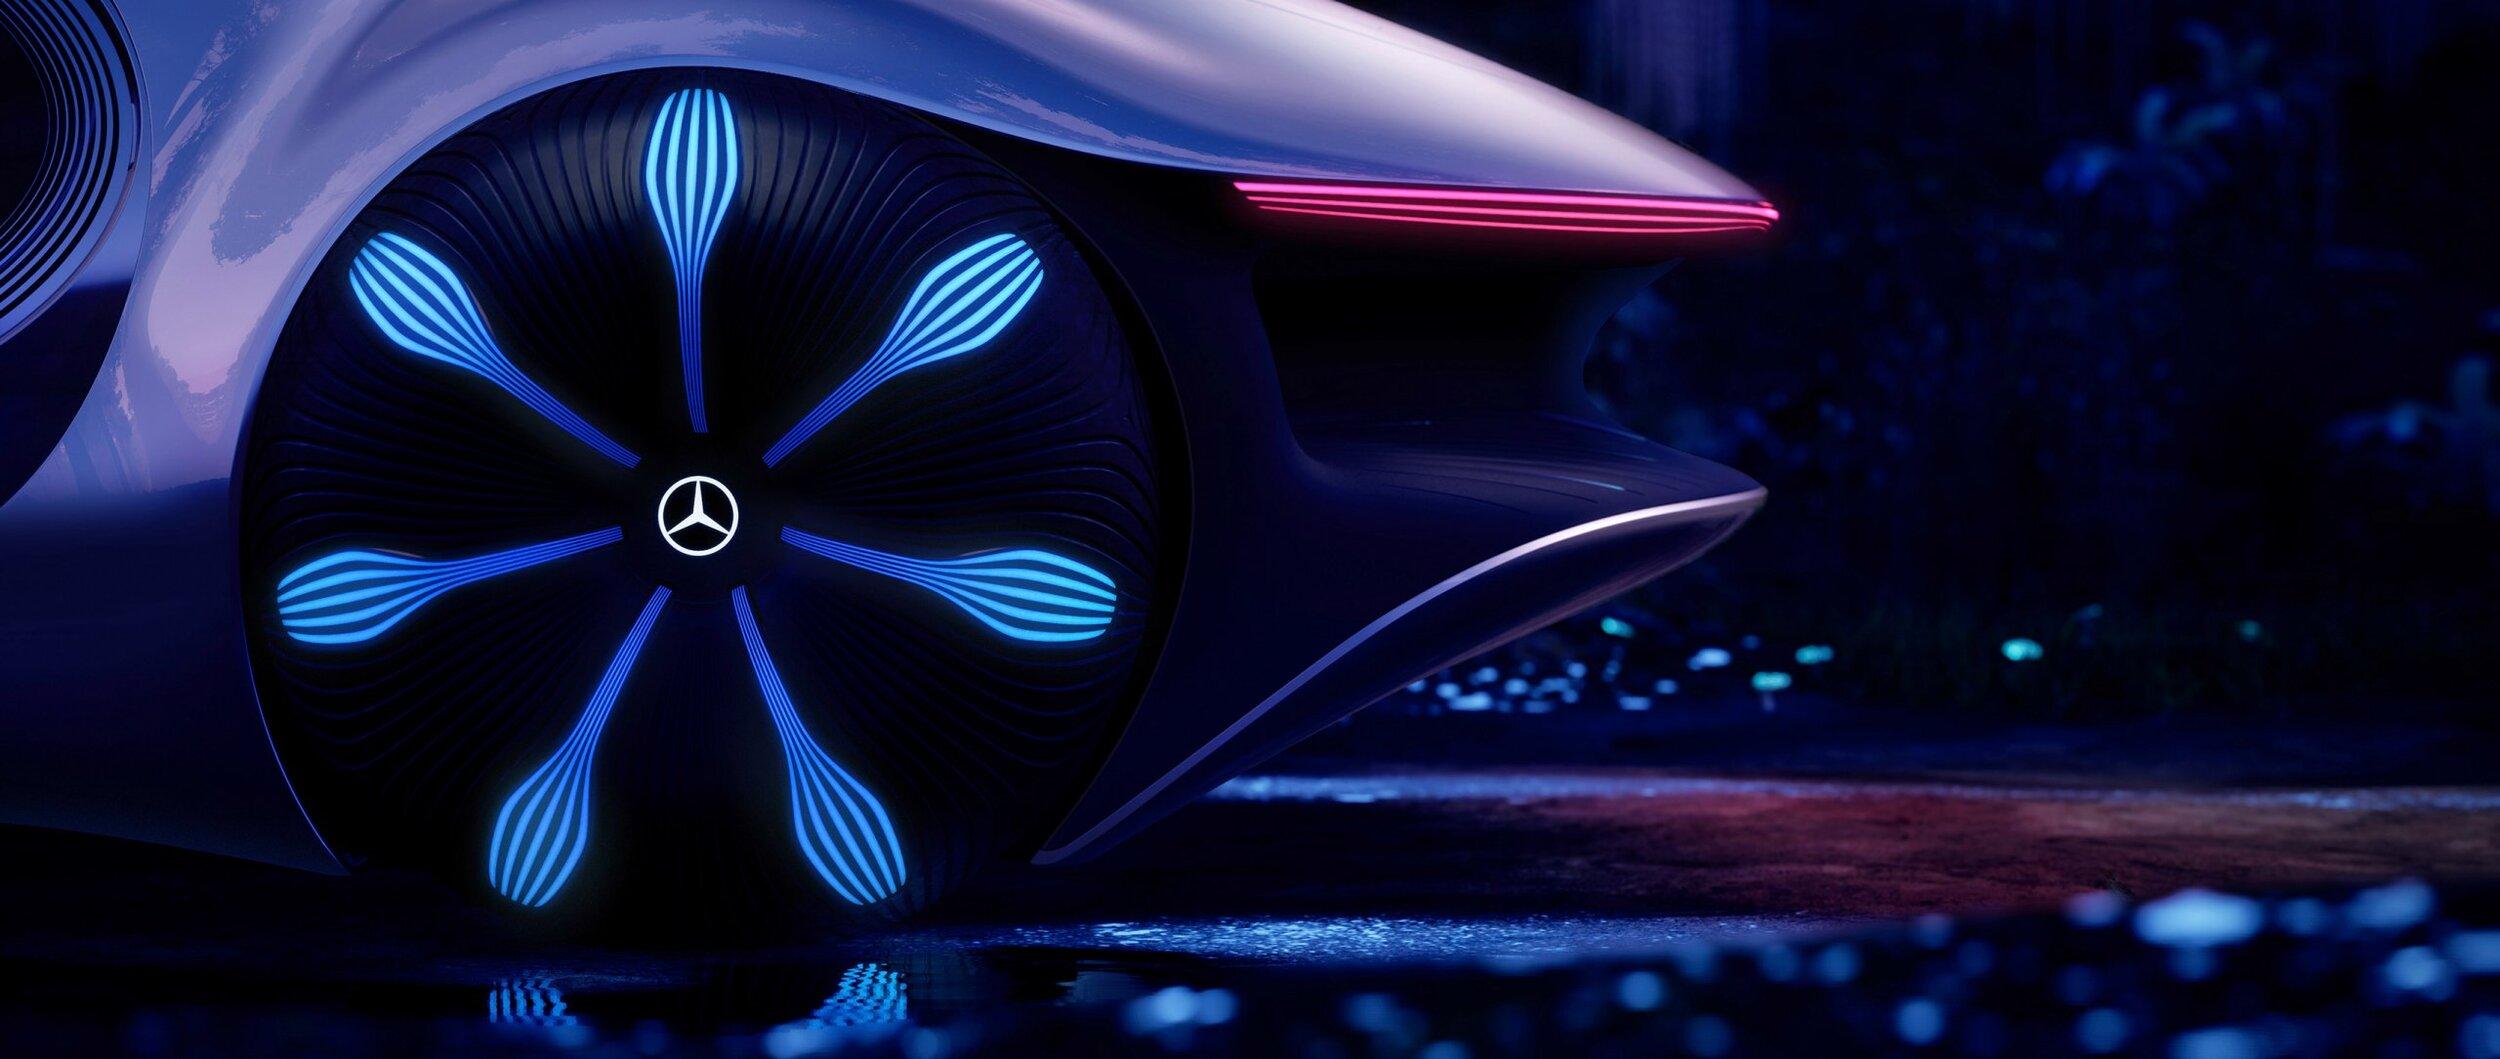 17-mercedes-benz-vehicles-concept-cars-vision-avtr-3400x1440.jpeg